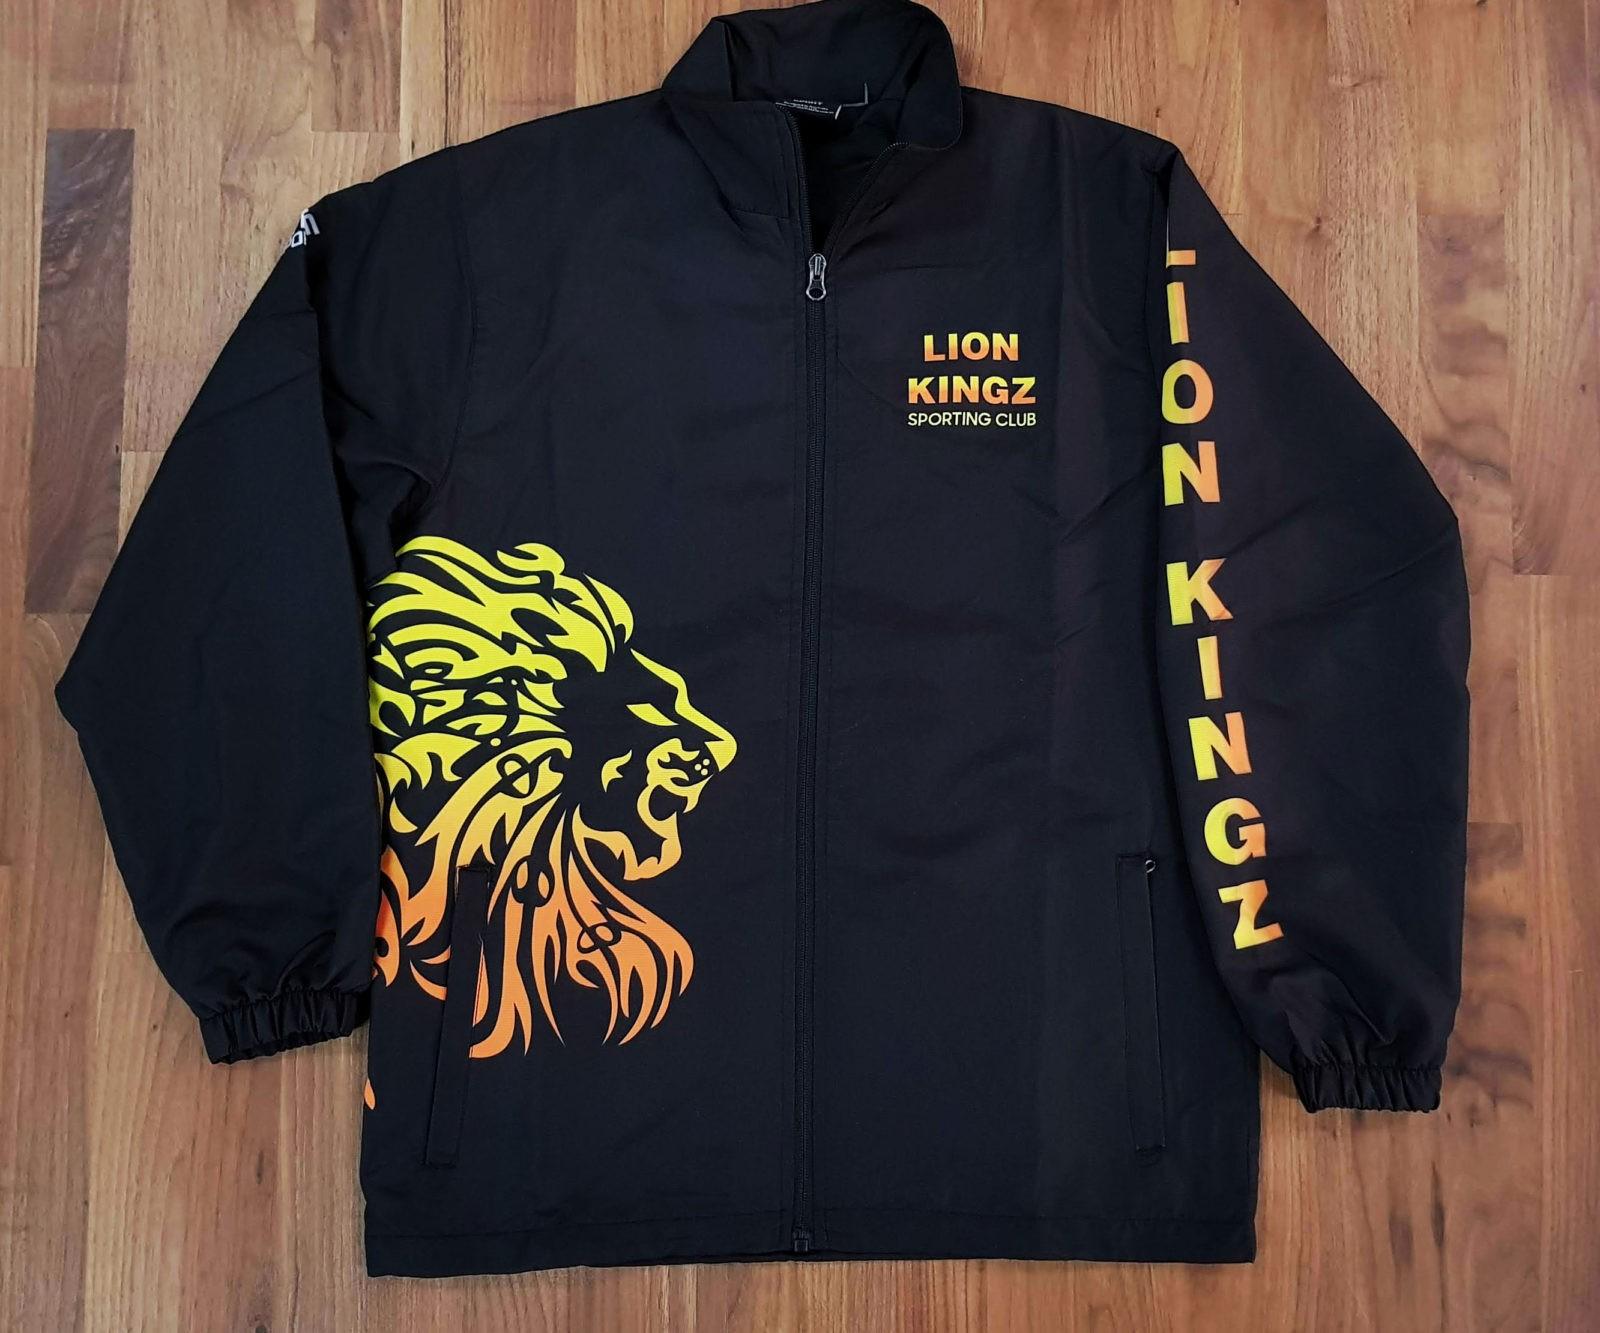 lionkings trackjacket front - Custom TRACKSUITS